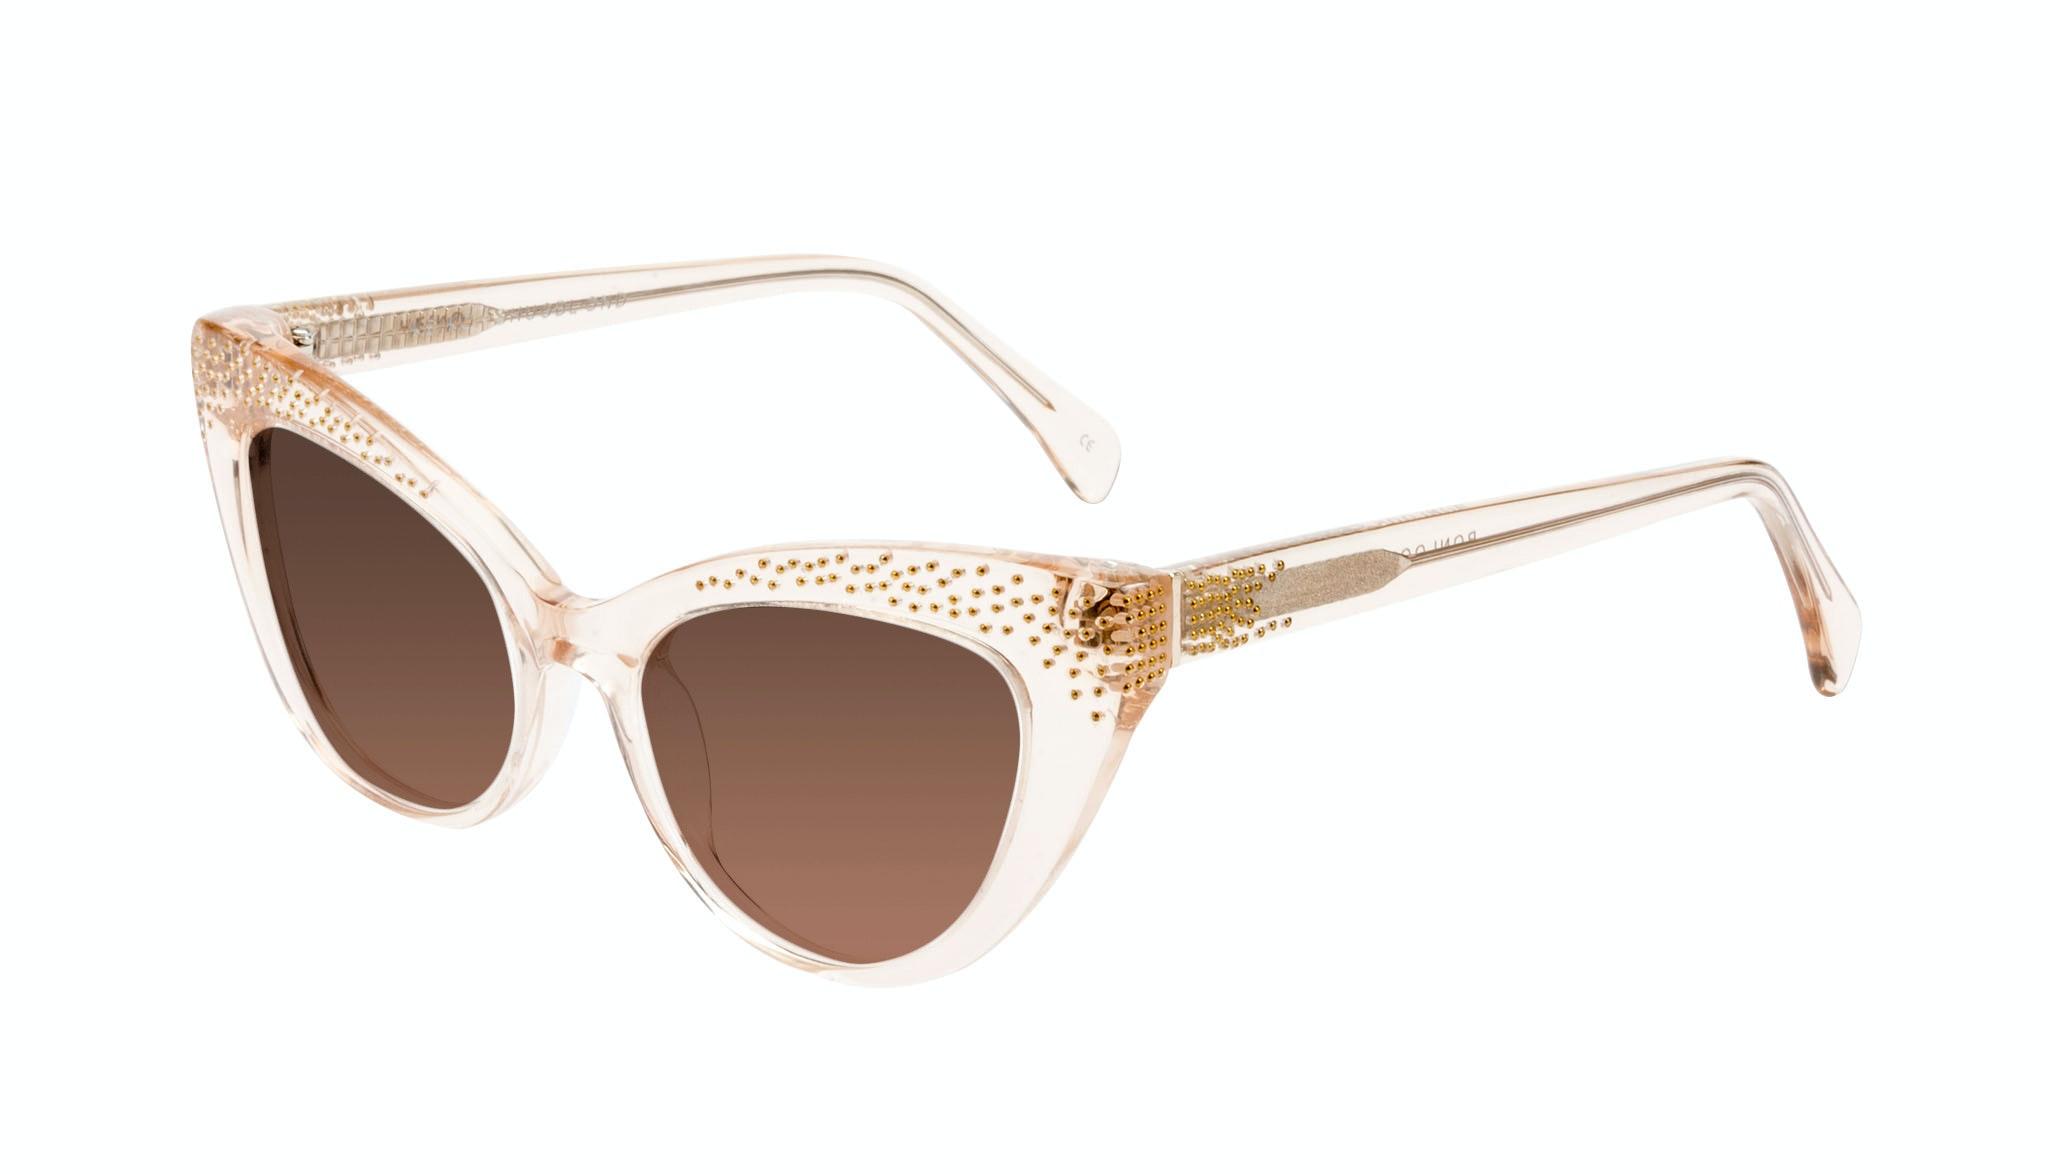 Affordable Fashion Glasses Cat Eye Daring Cateye Sunglasses Women Keiko Shug Blond Tilt